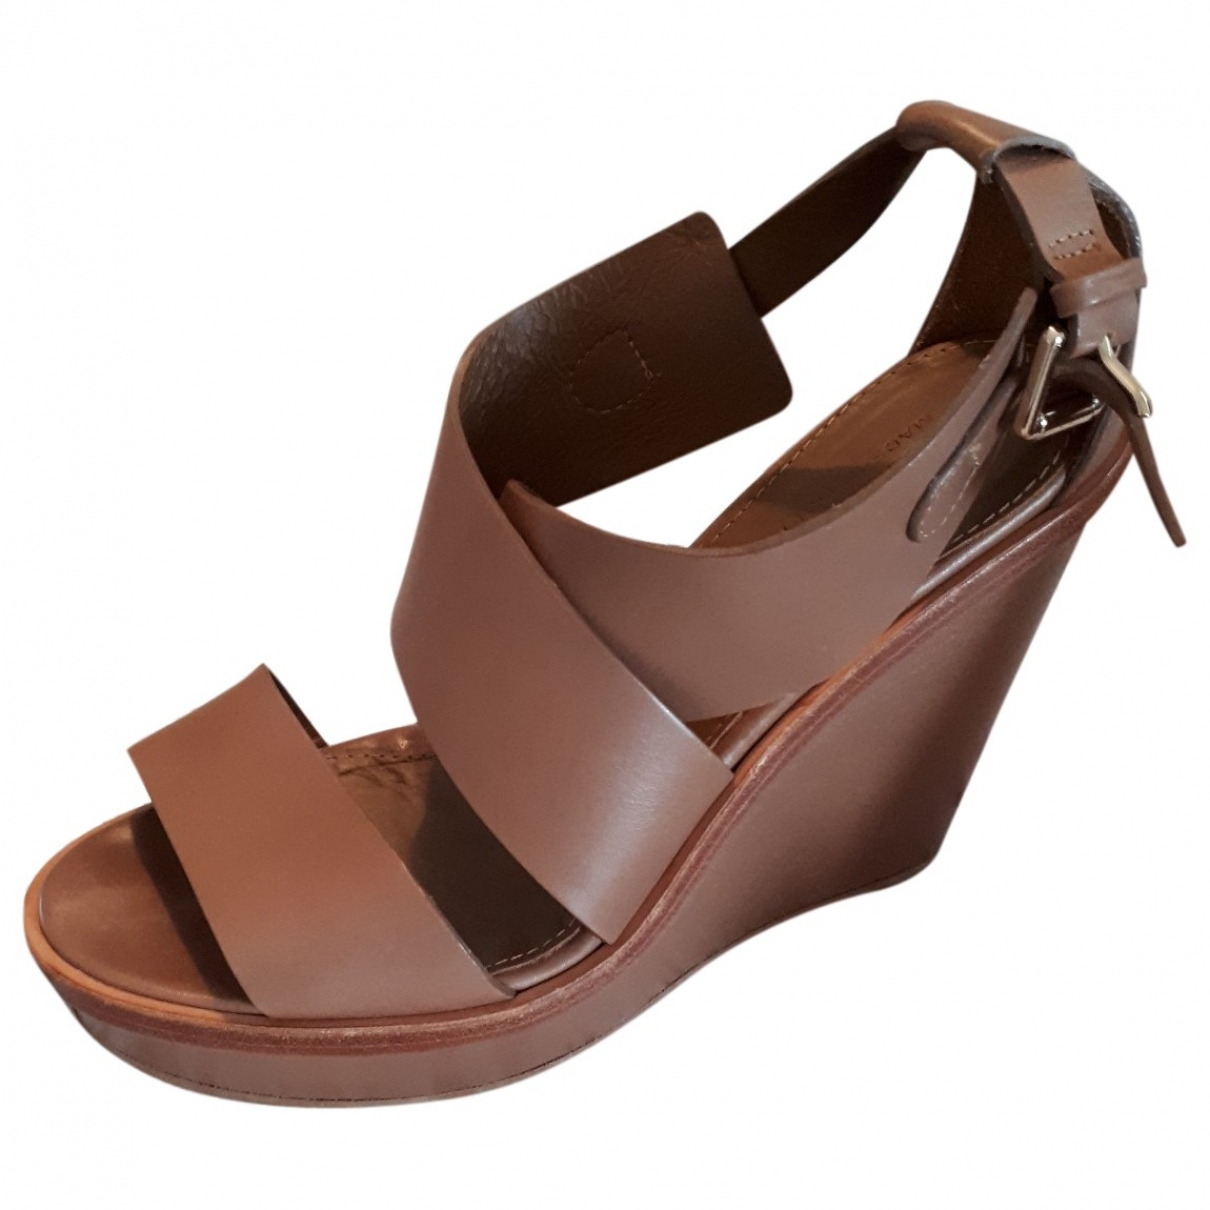 Max Mara \N Camel Leather Sandals for Women 38 EU